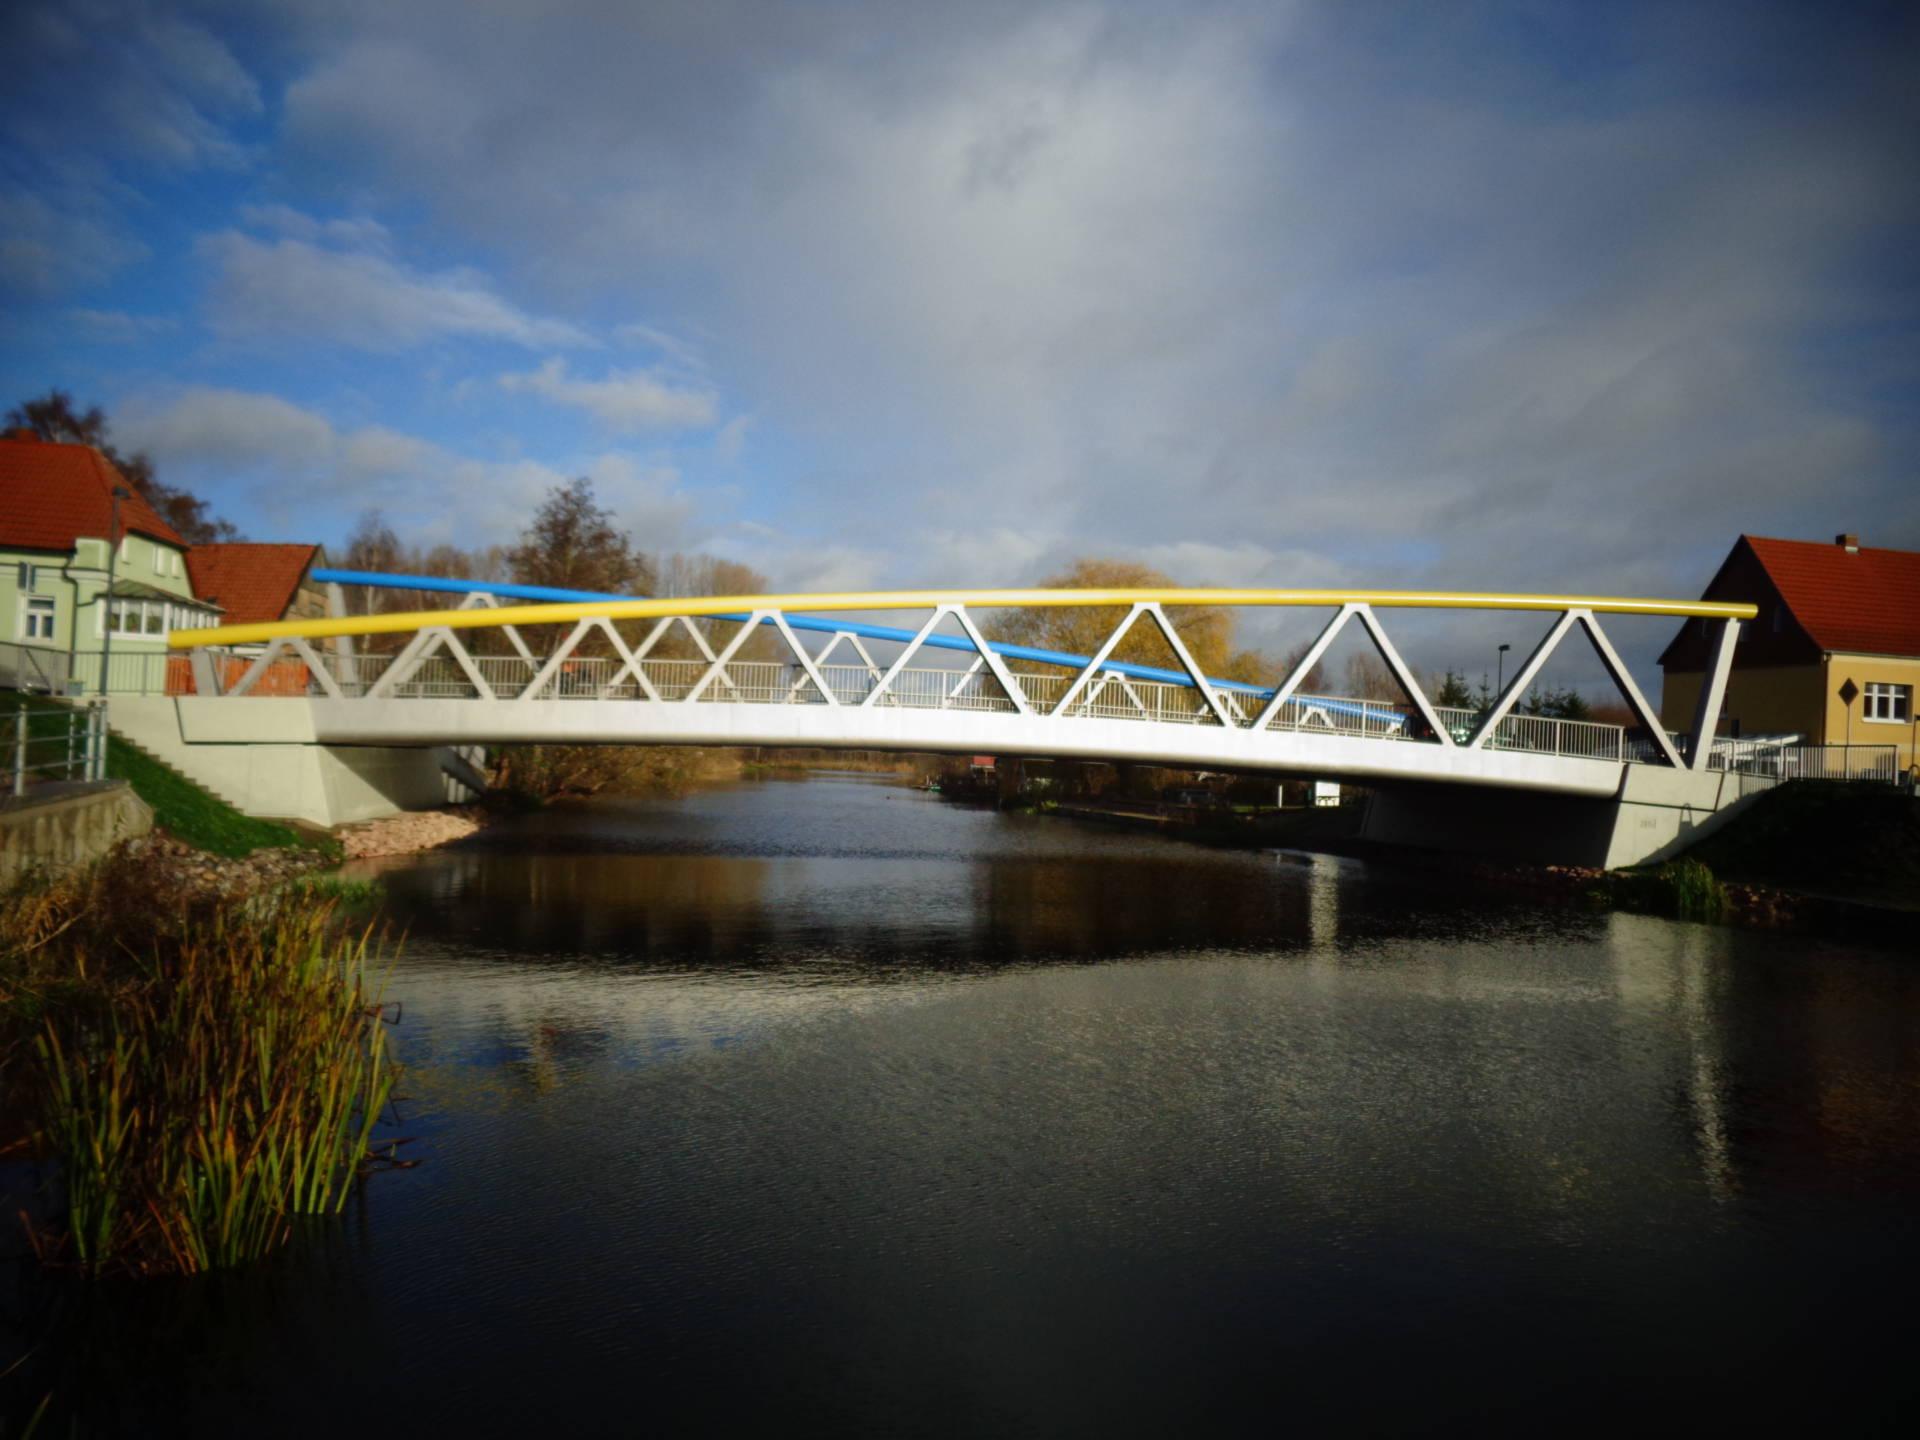 Foto Ersatzneubau Warnow Brücke Schwaan